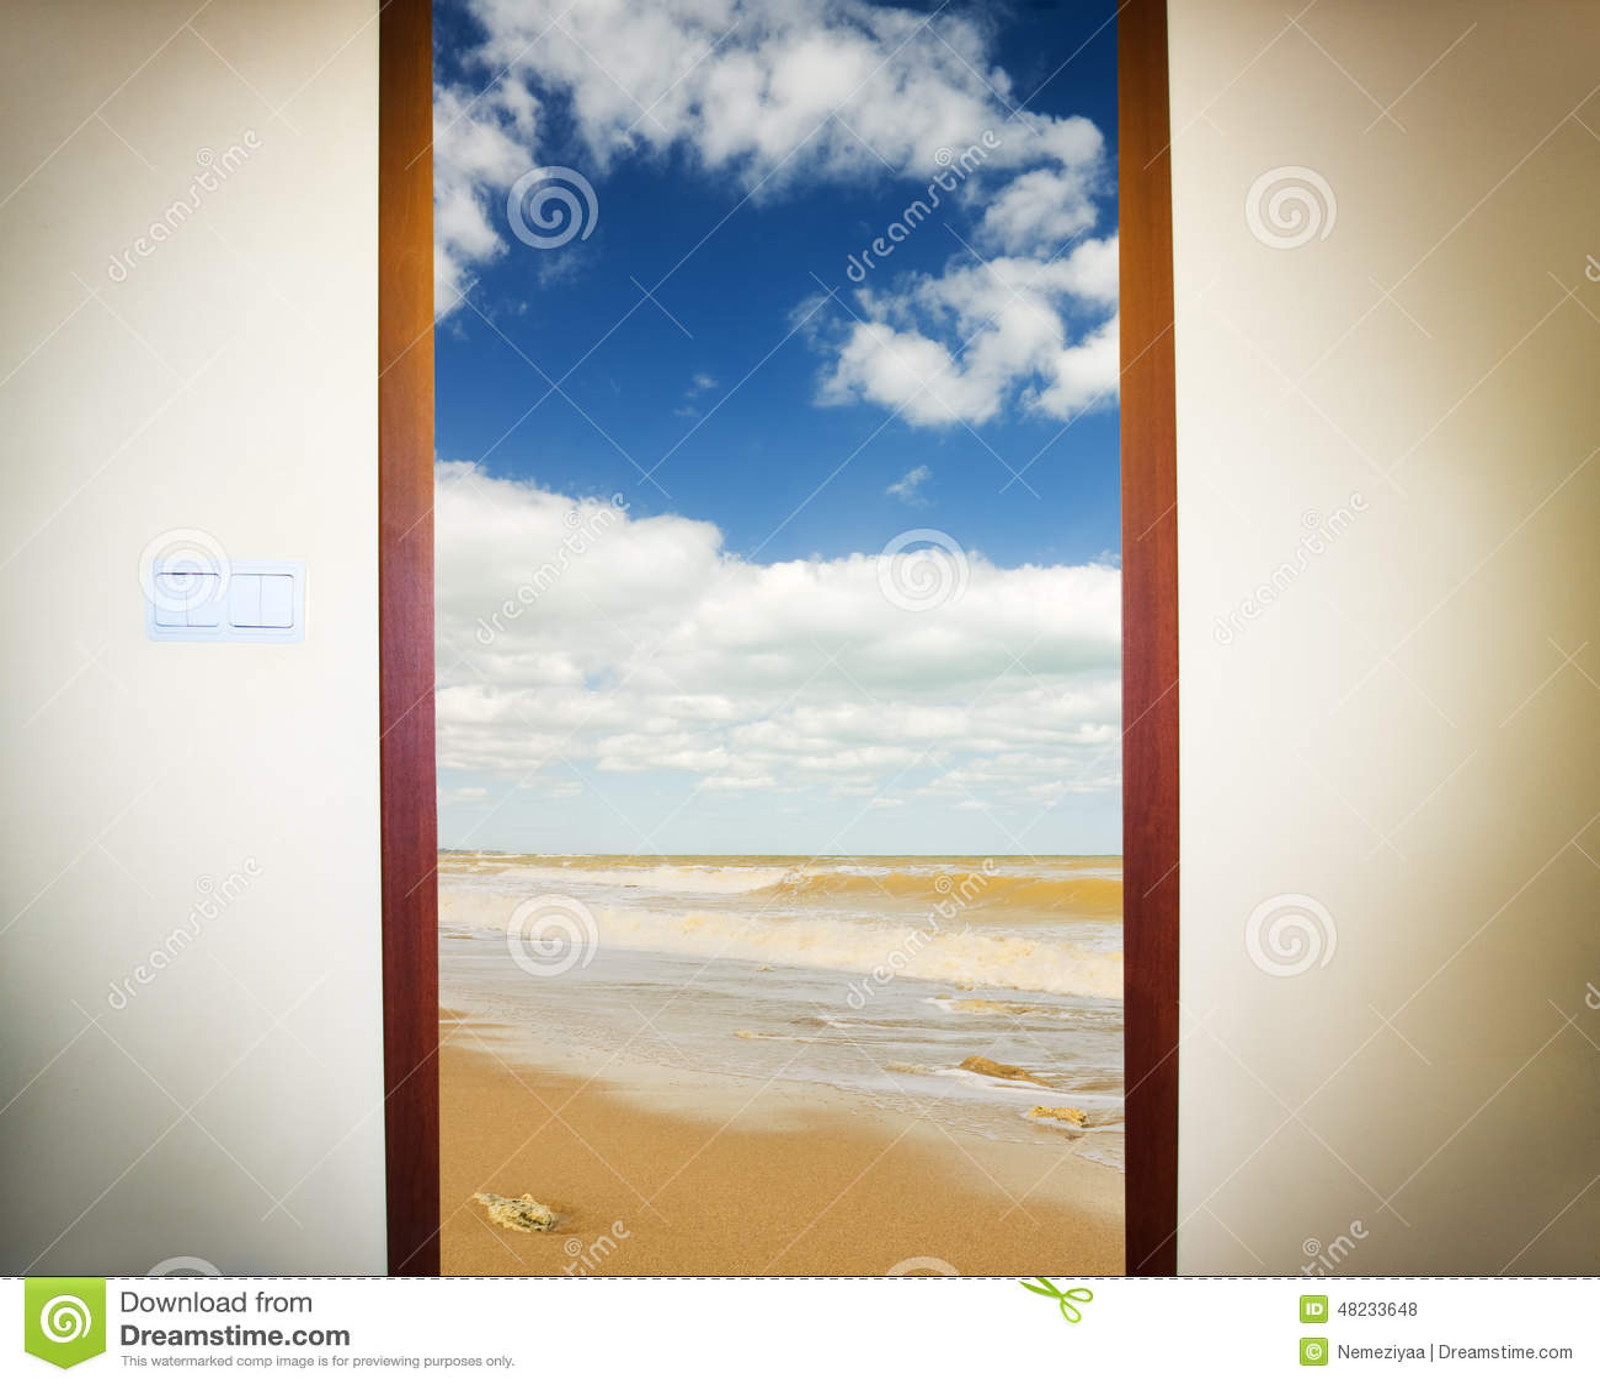 photo d 39 une porte ouverte illustration stock image 48233648. Black Bedroom Furniture Sets. Home Design Ideas